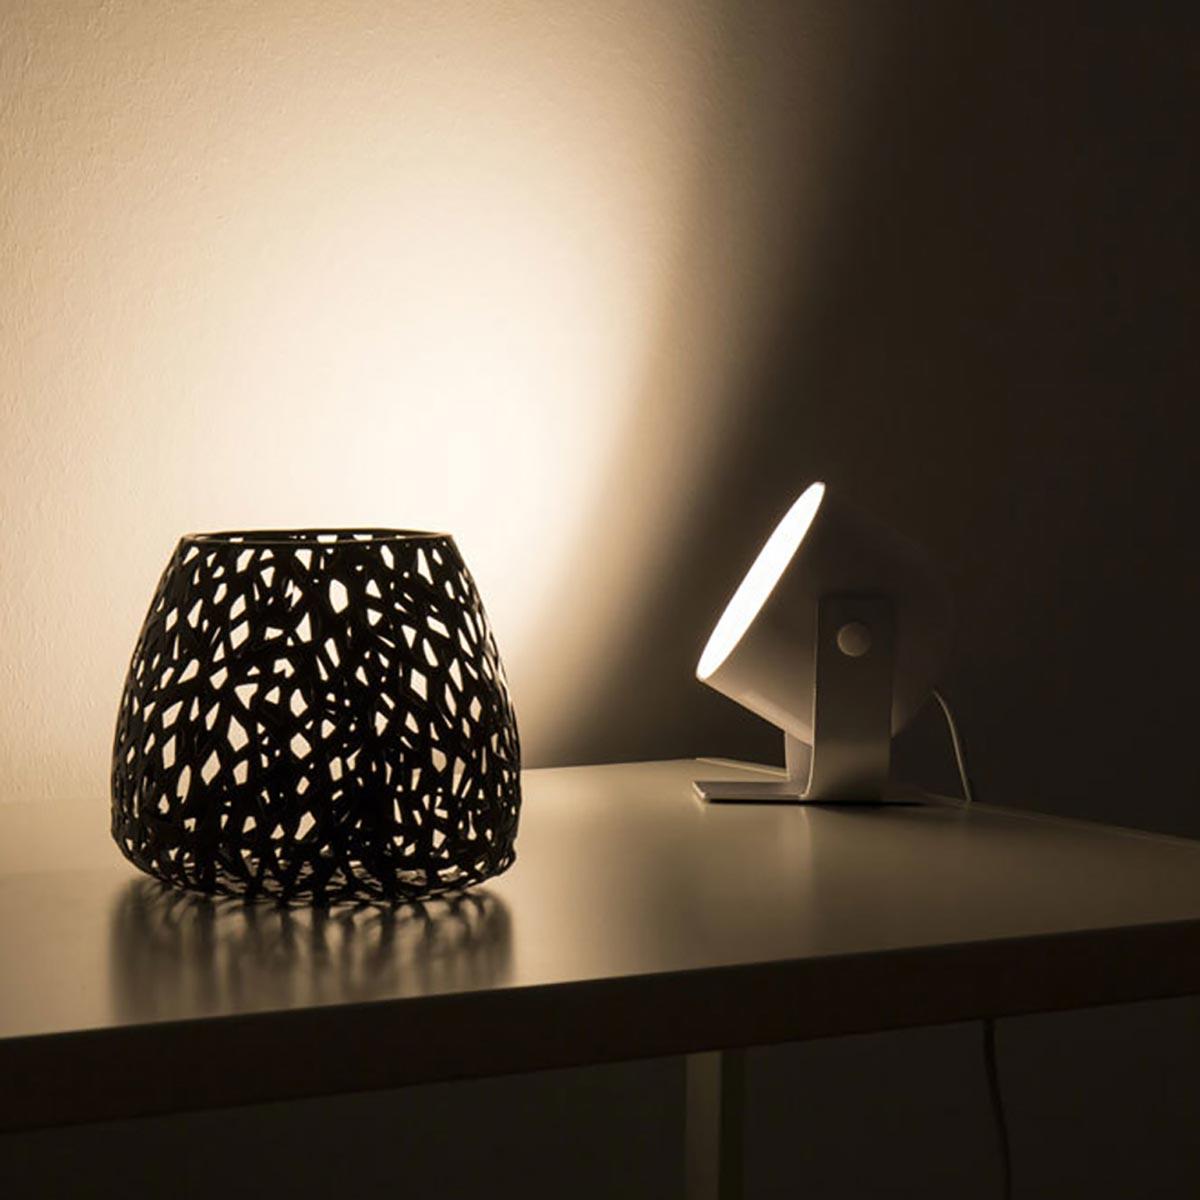 led tischleuchte projektor s idual 8 5w 380lm mit fernbedienung. Black Bedroom Furniture Sets. Home Design Ideas